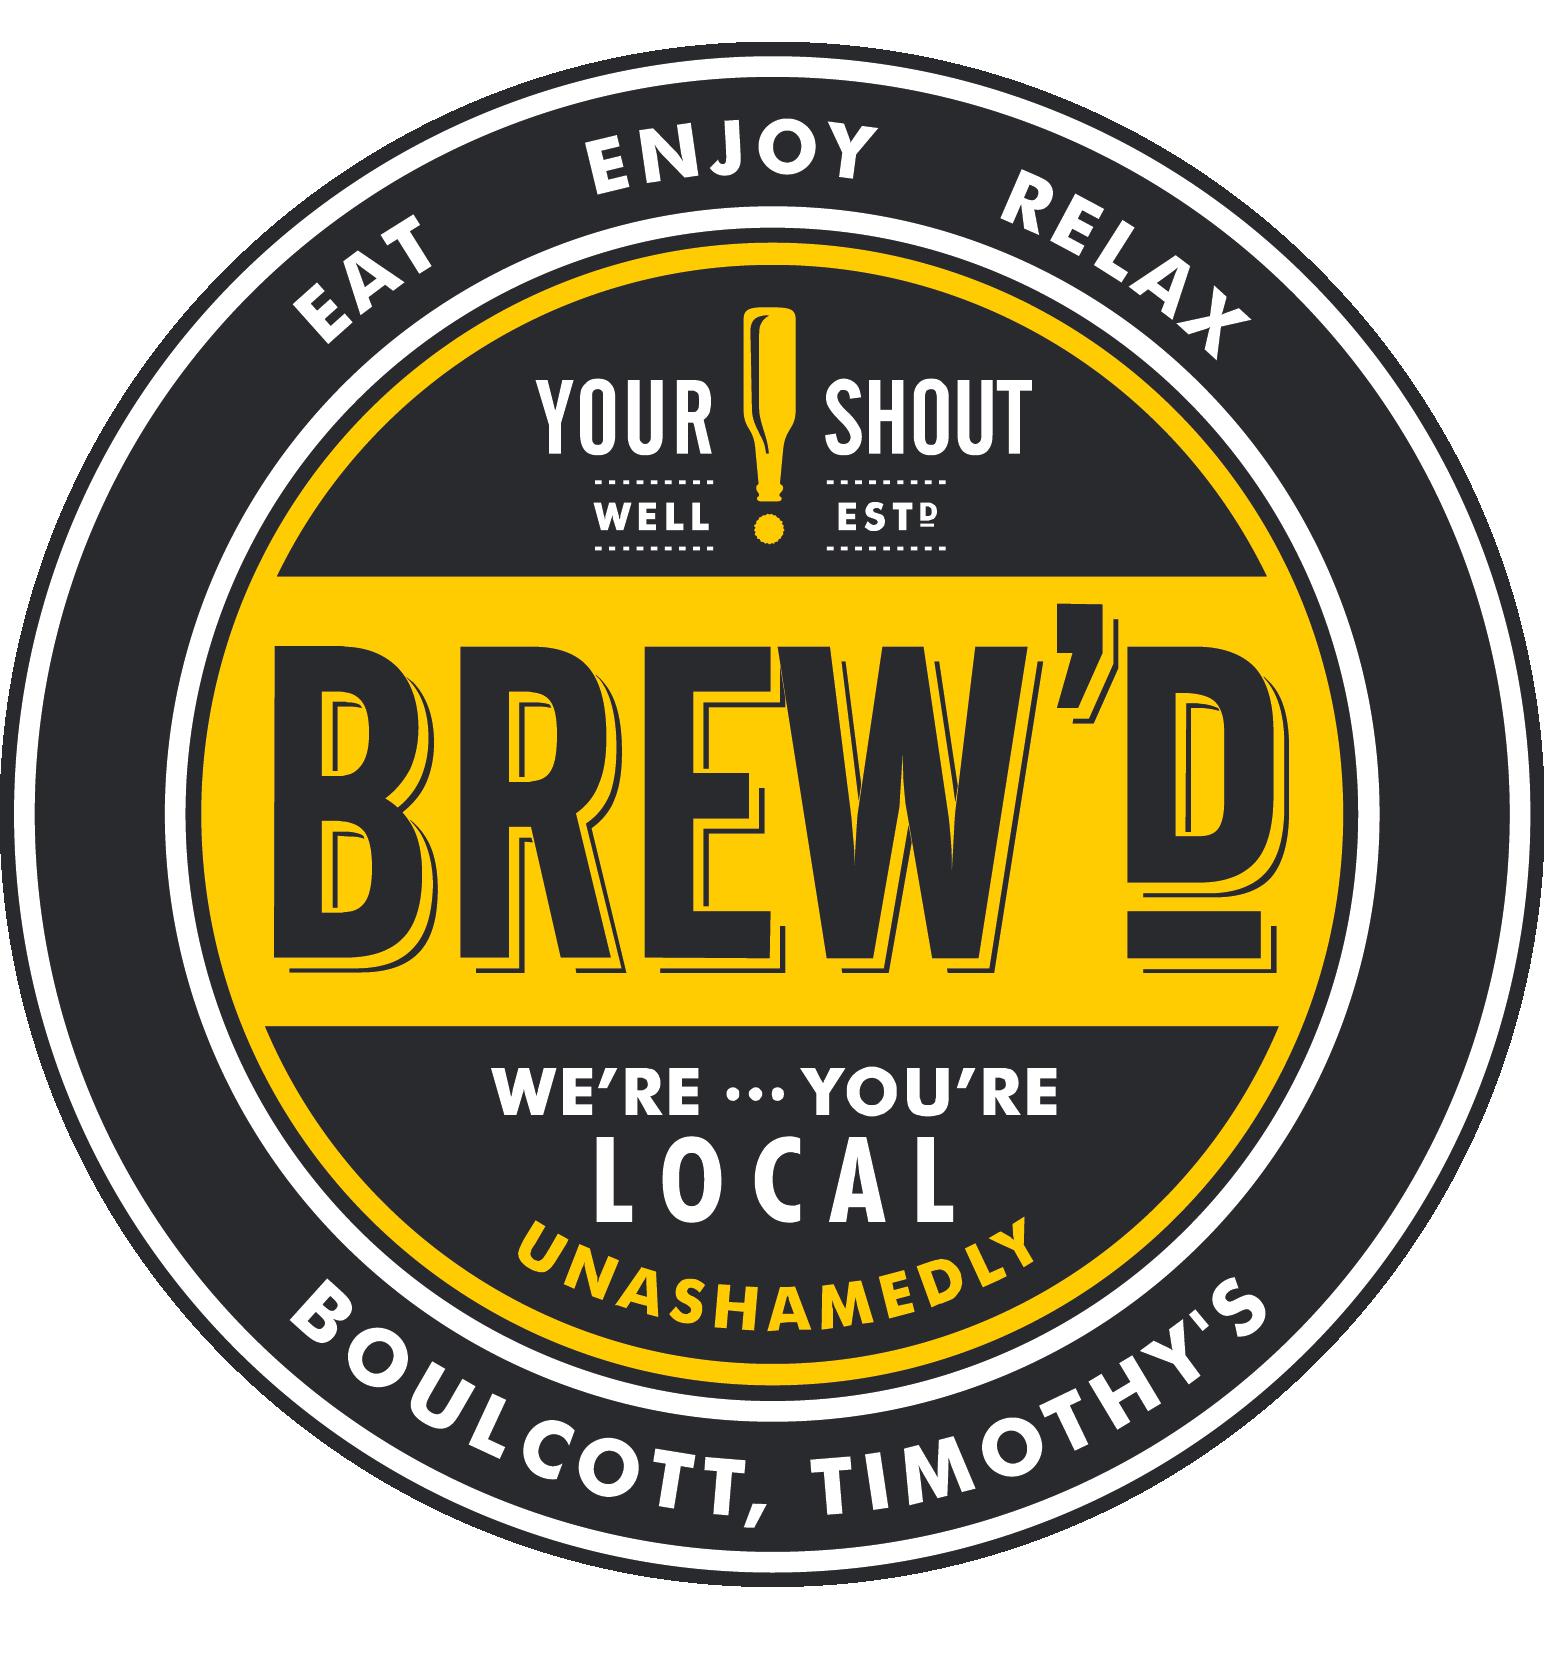 Brew'd Boulcott